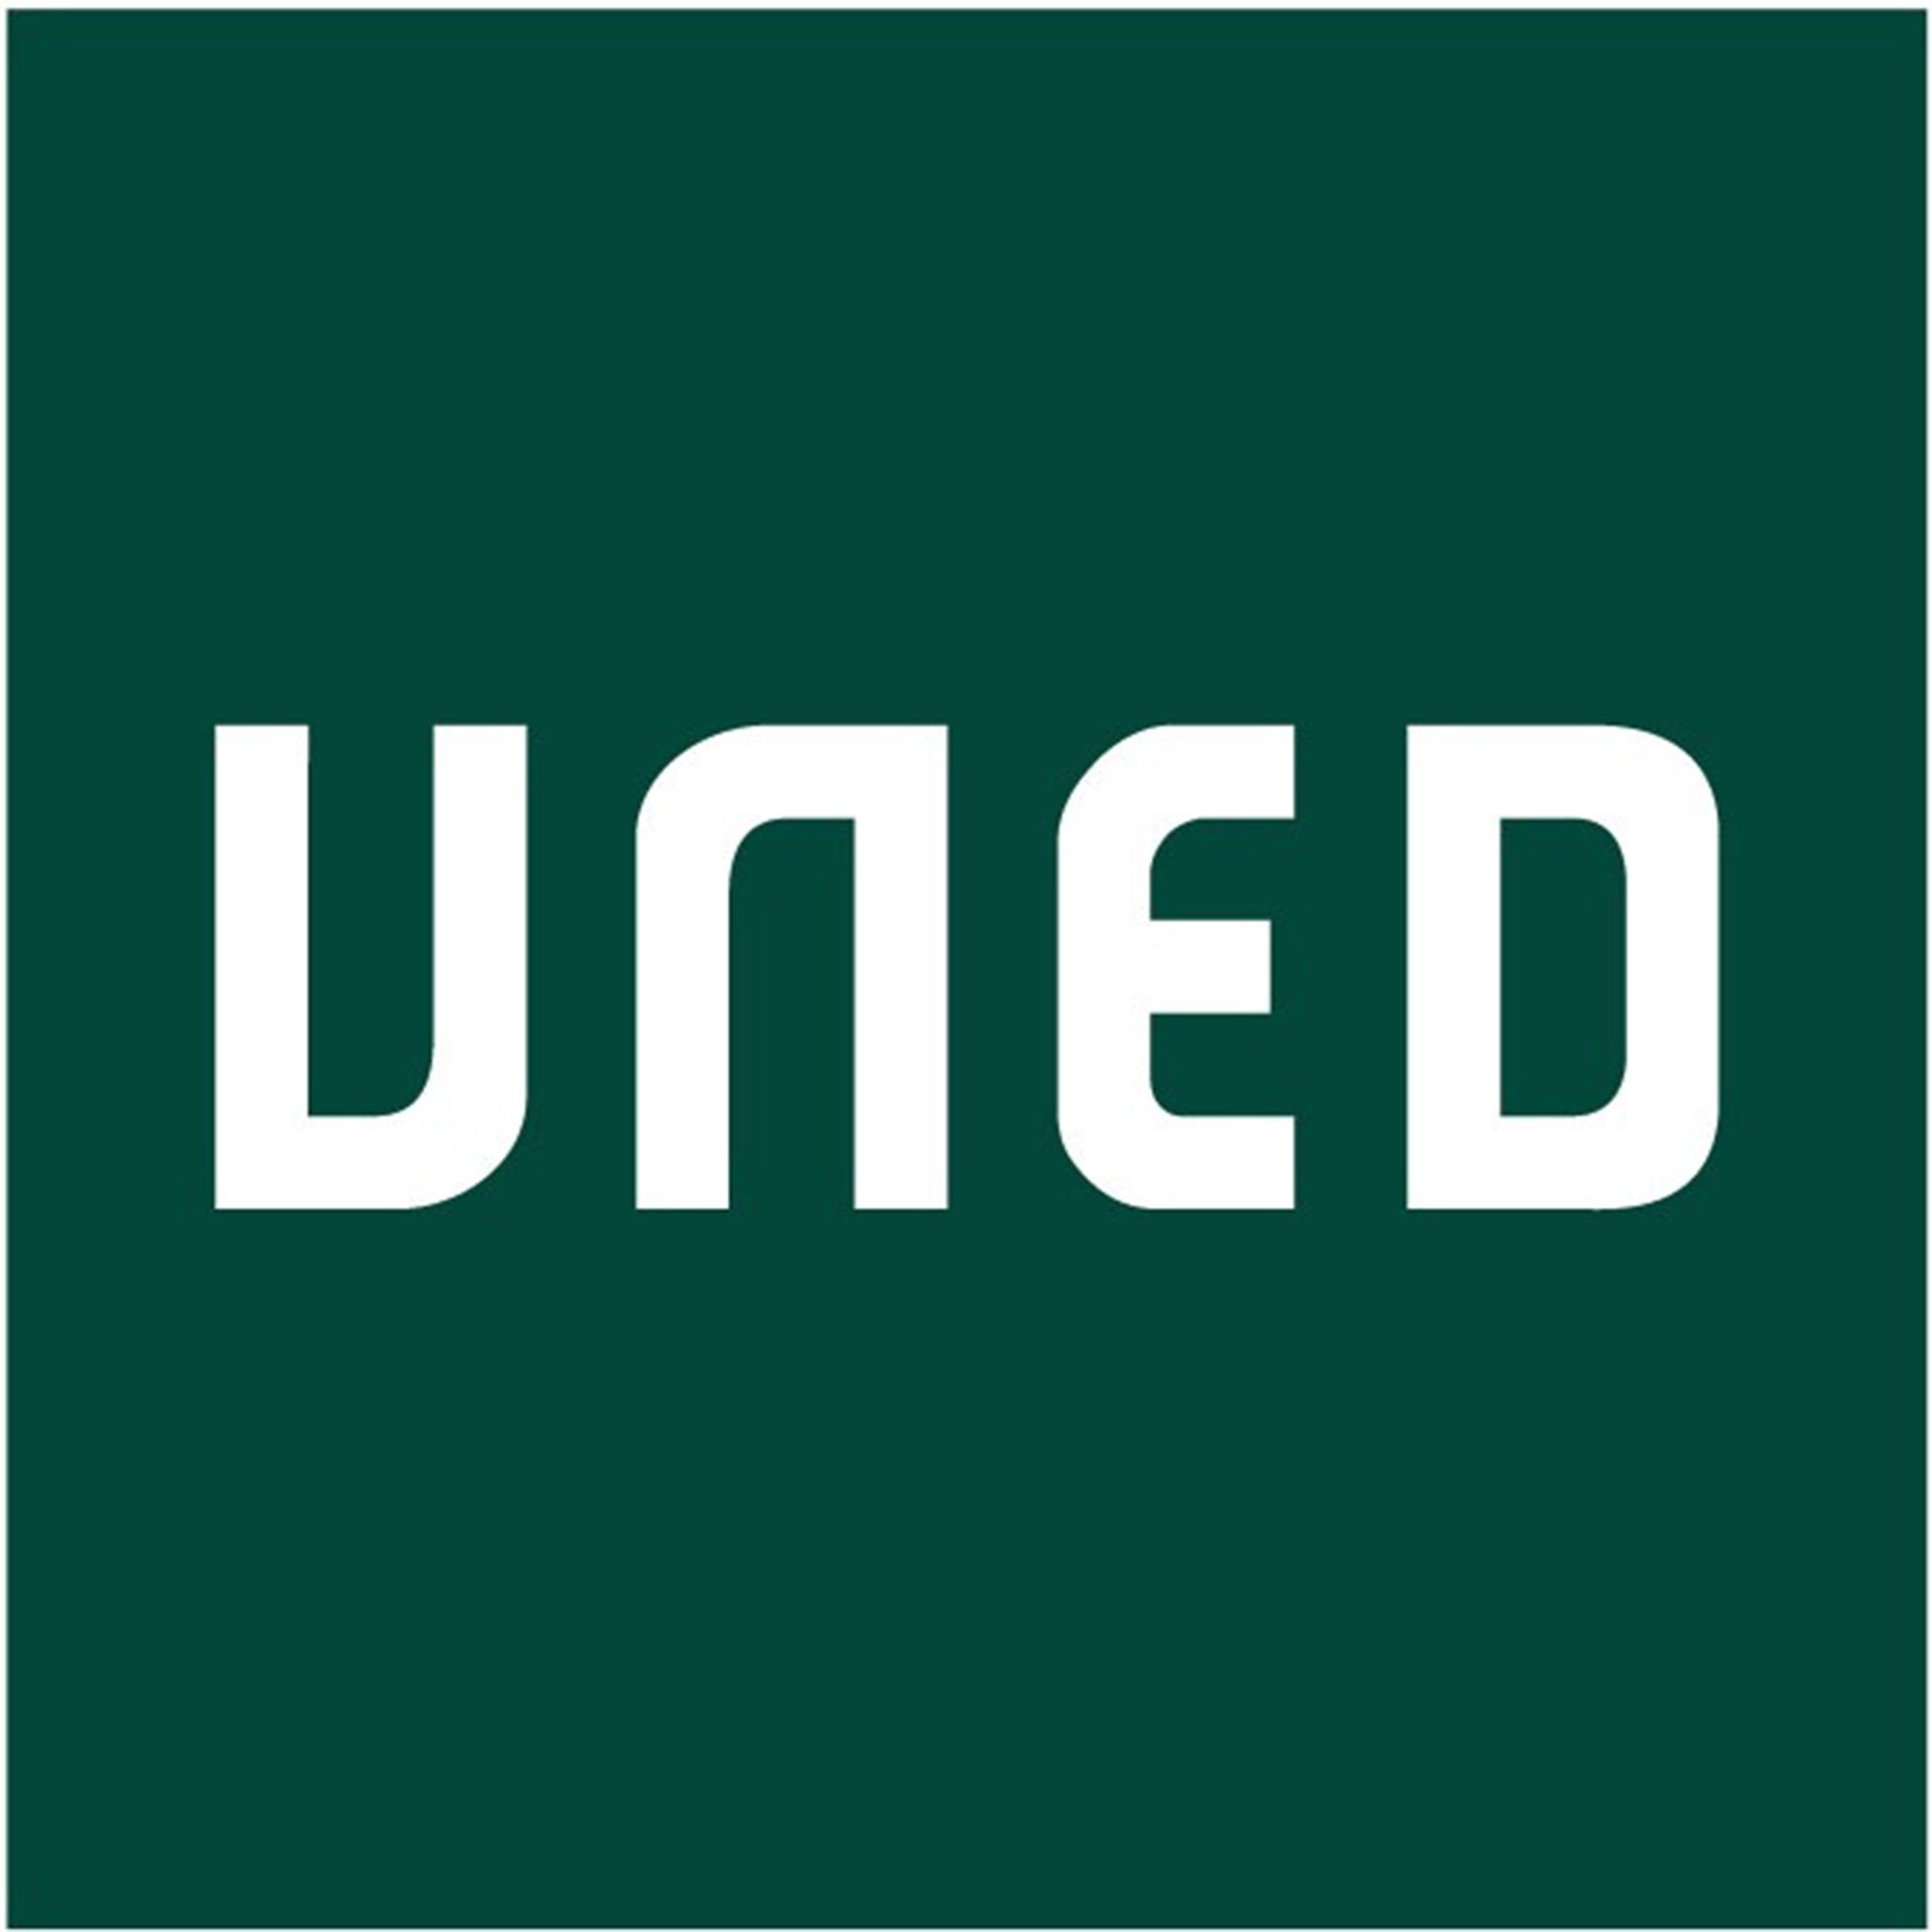 Logo-UNED-verde-alt-reso1